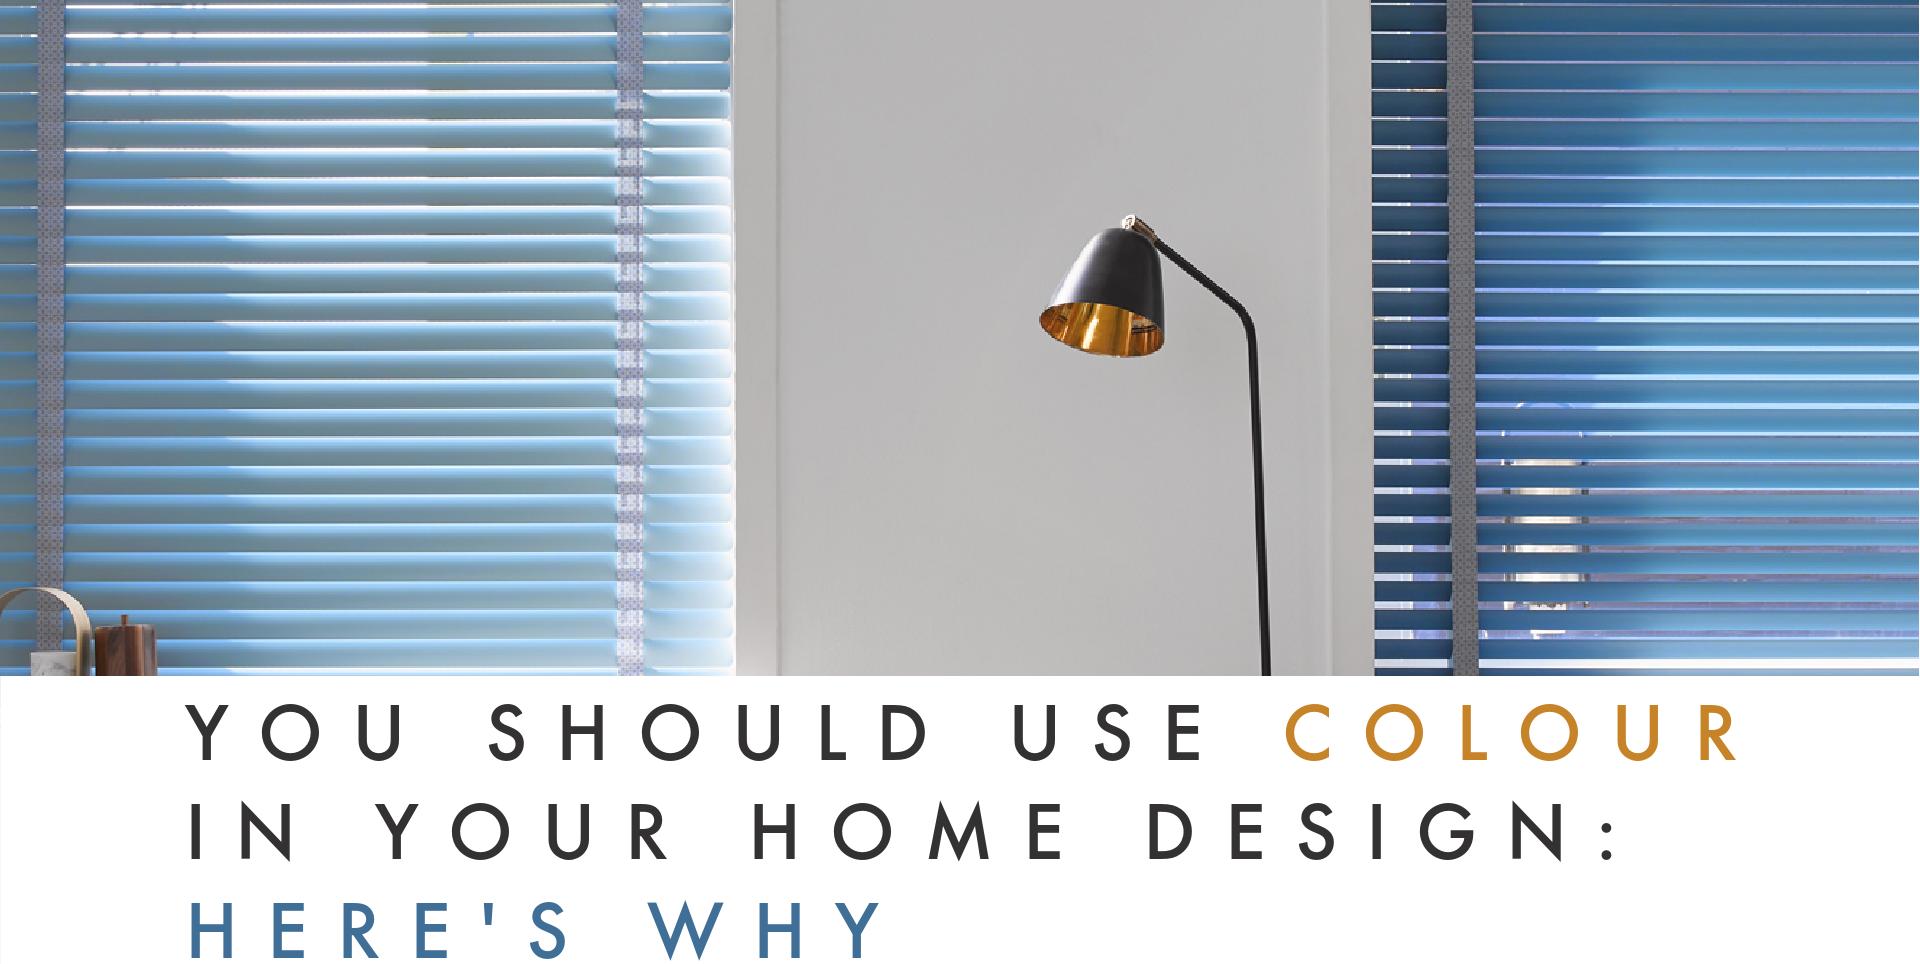 Blue blinds in Home Design